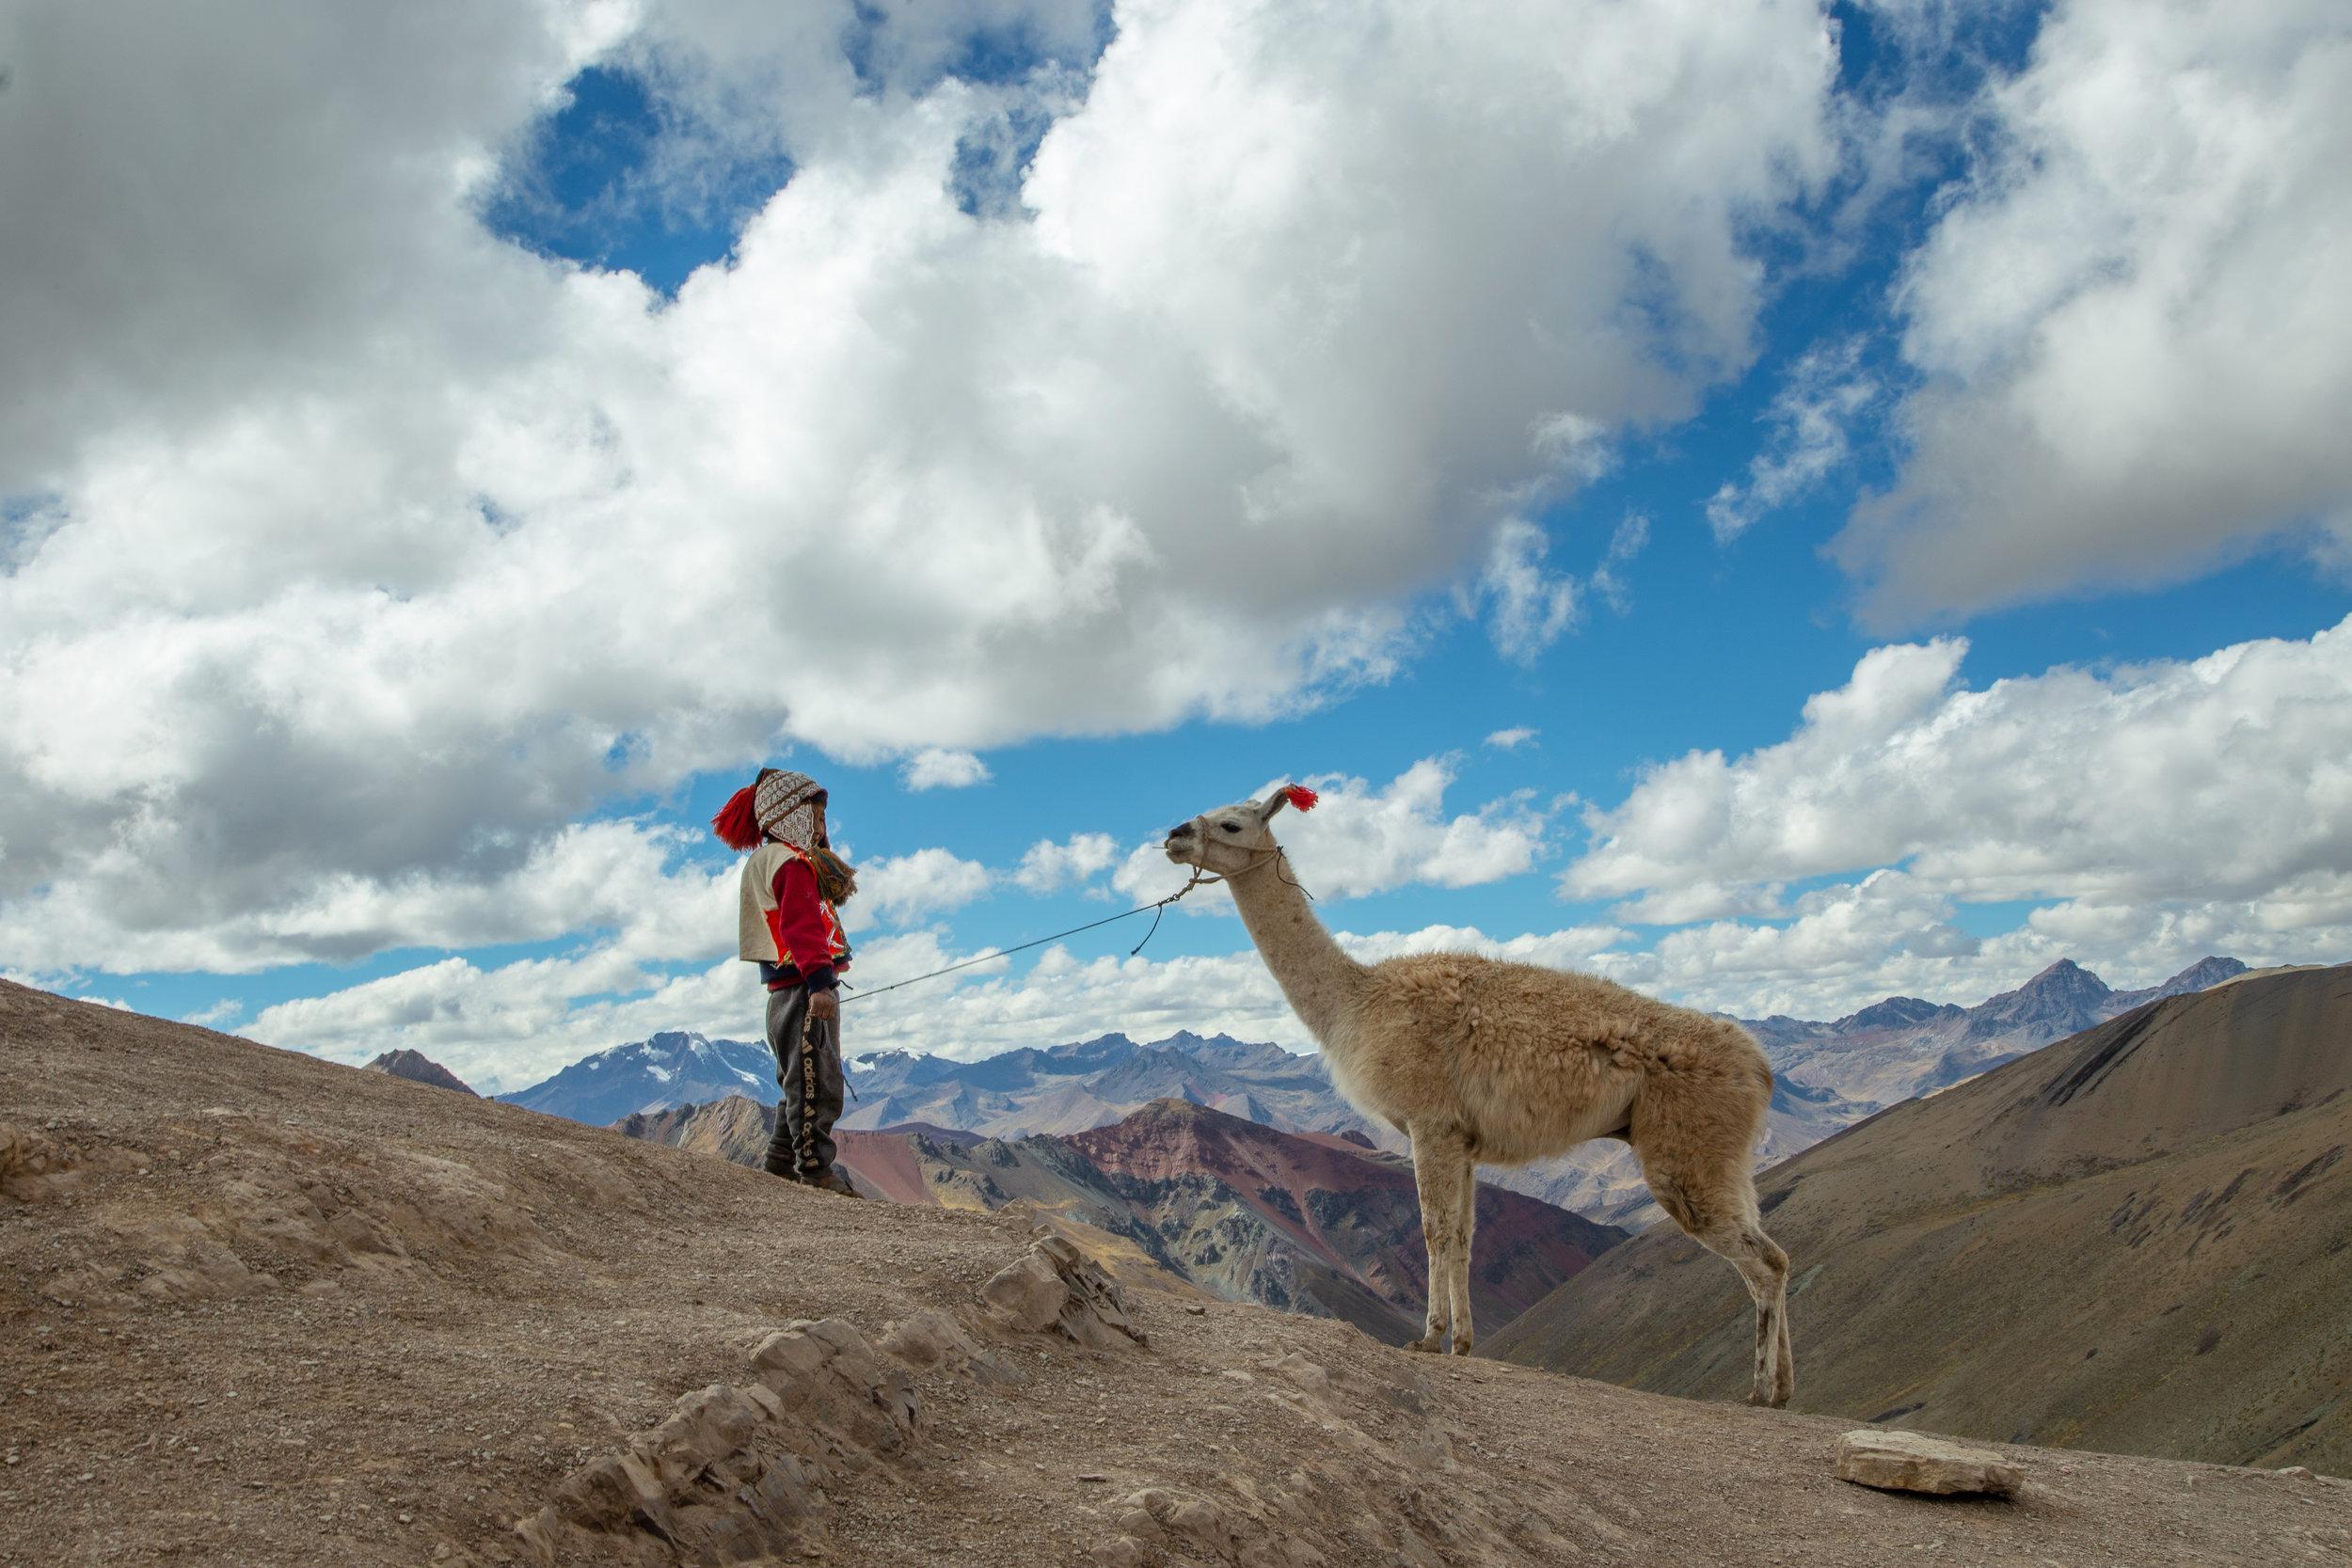 Boy and Alpaca - Rainbow Mountain, Cusco Region